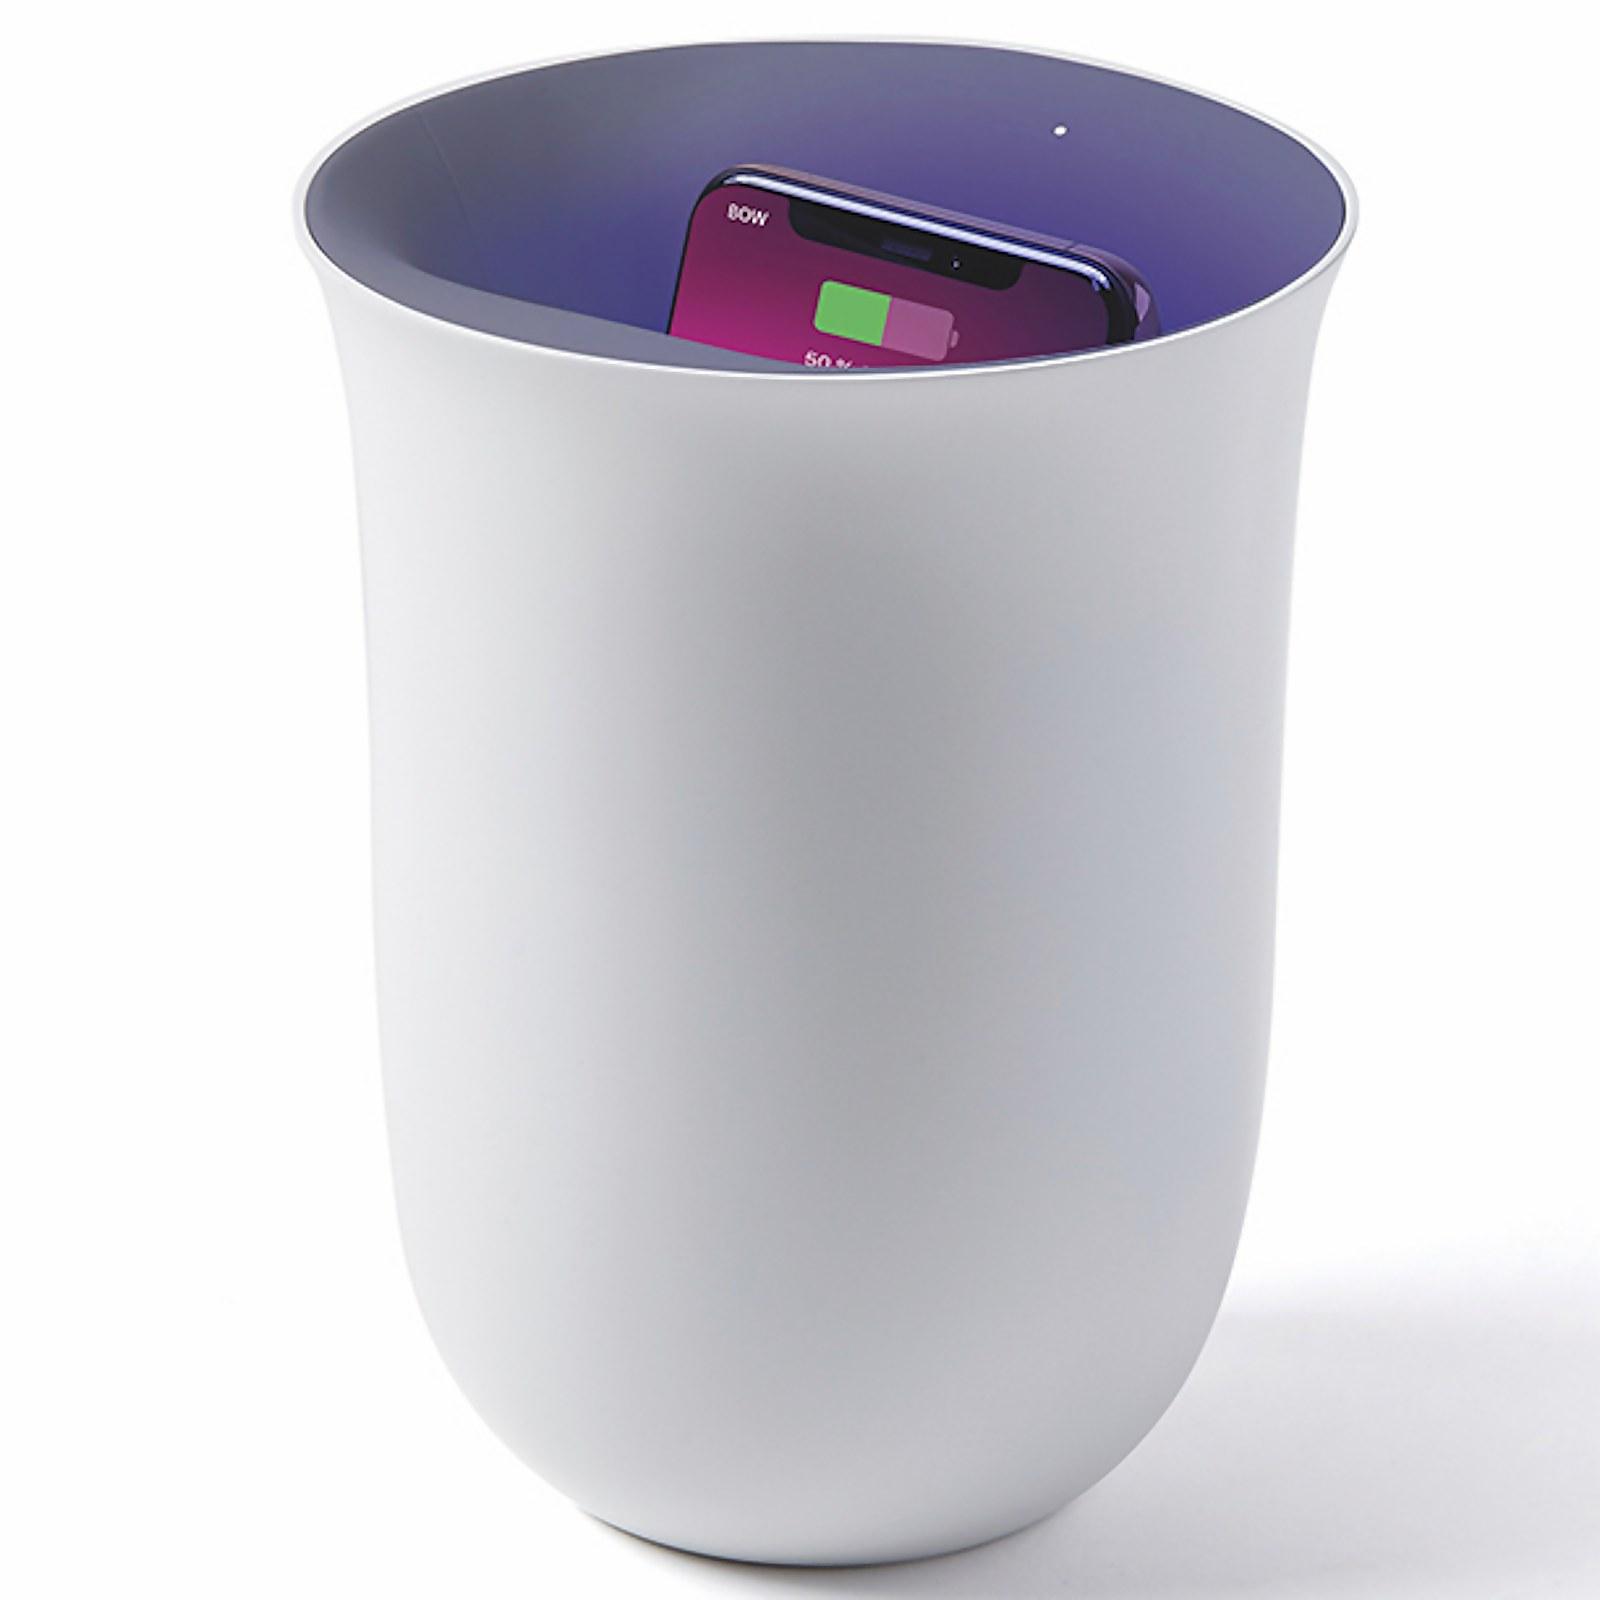 Lexon Oblio Wireless Charging Station and UV Sanitiser - White